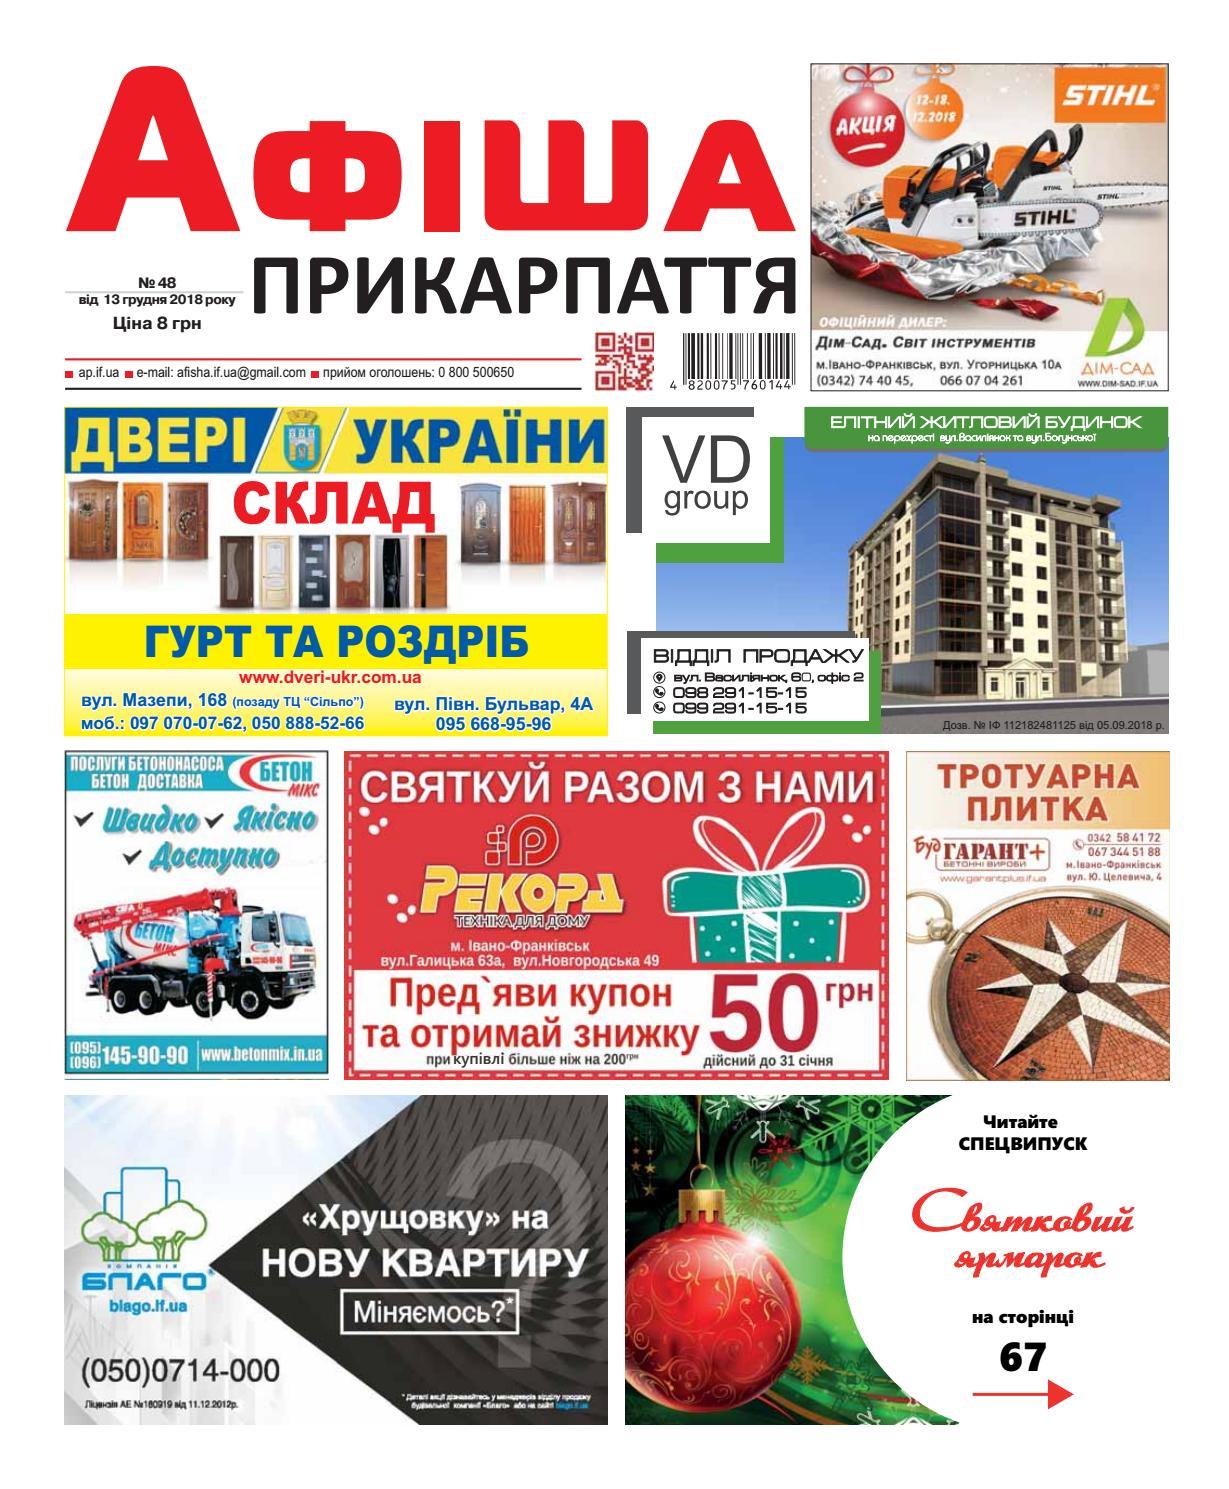 Афіша Прикарпаття №48 by Olya Olya - issuu b4d05e20994c2